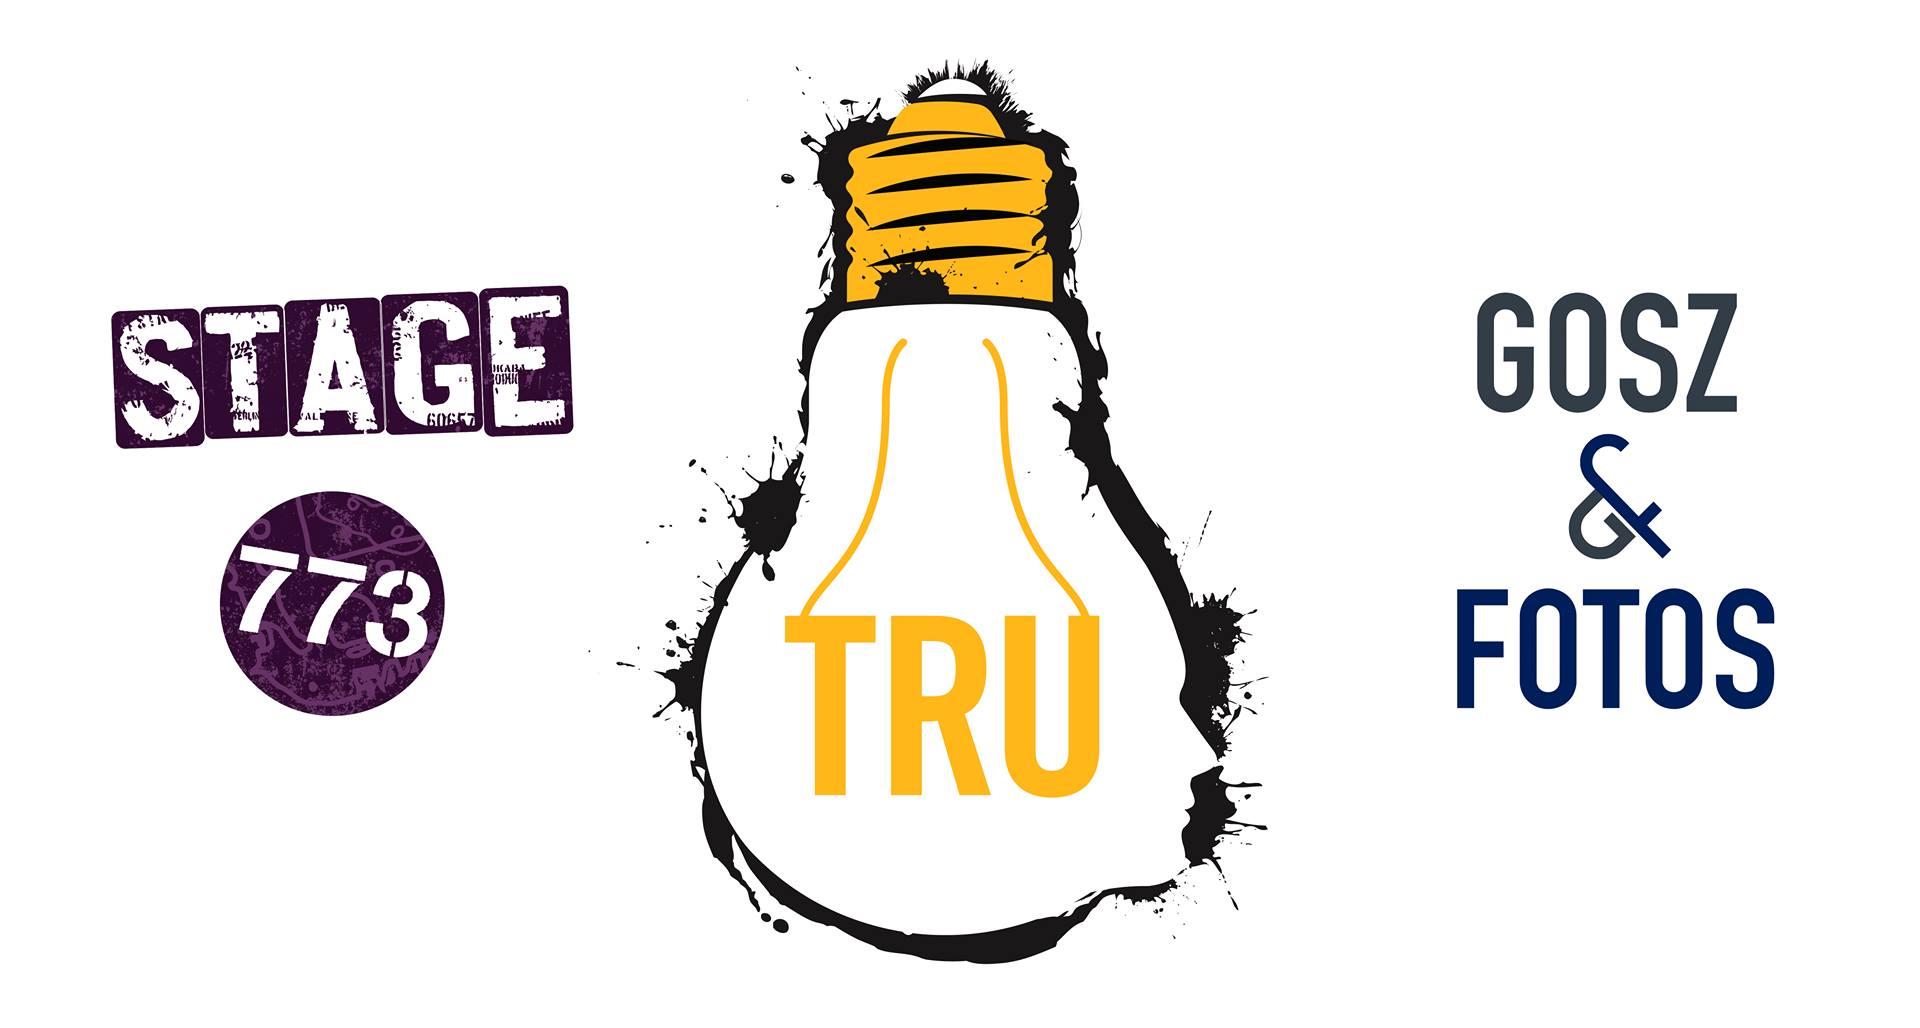 TRU - A Musical for Mental Health